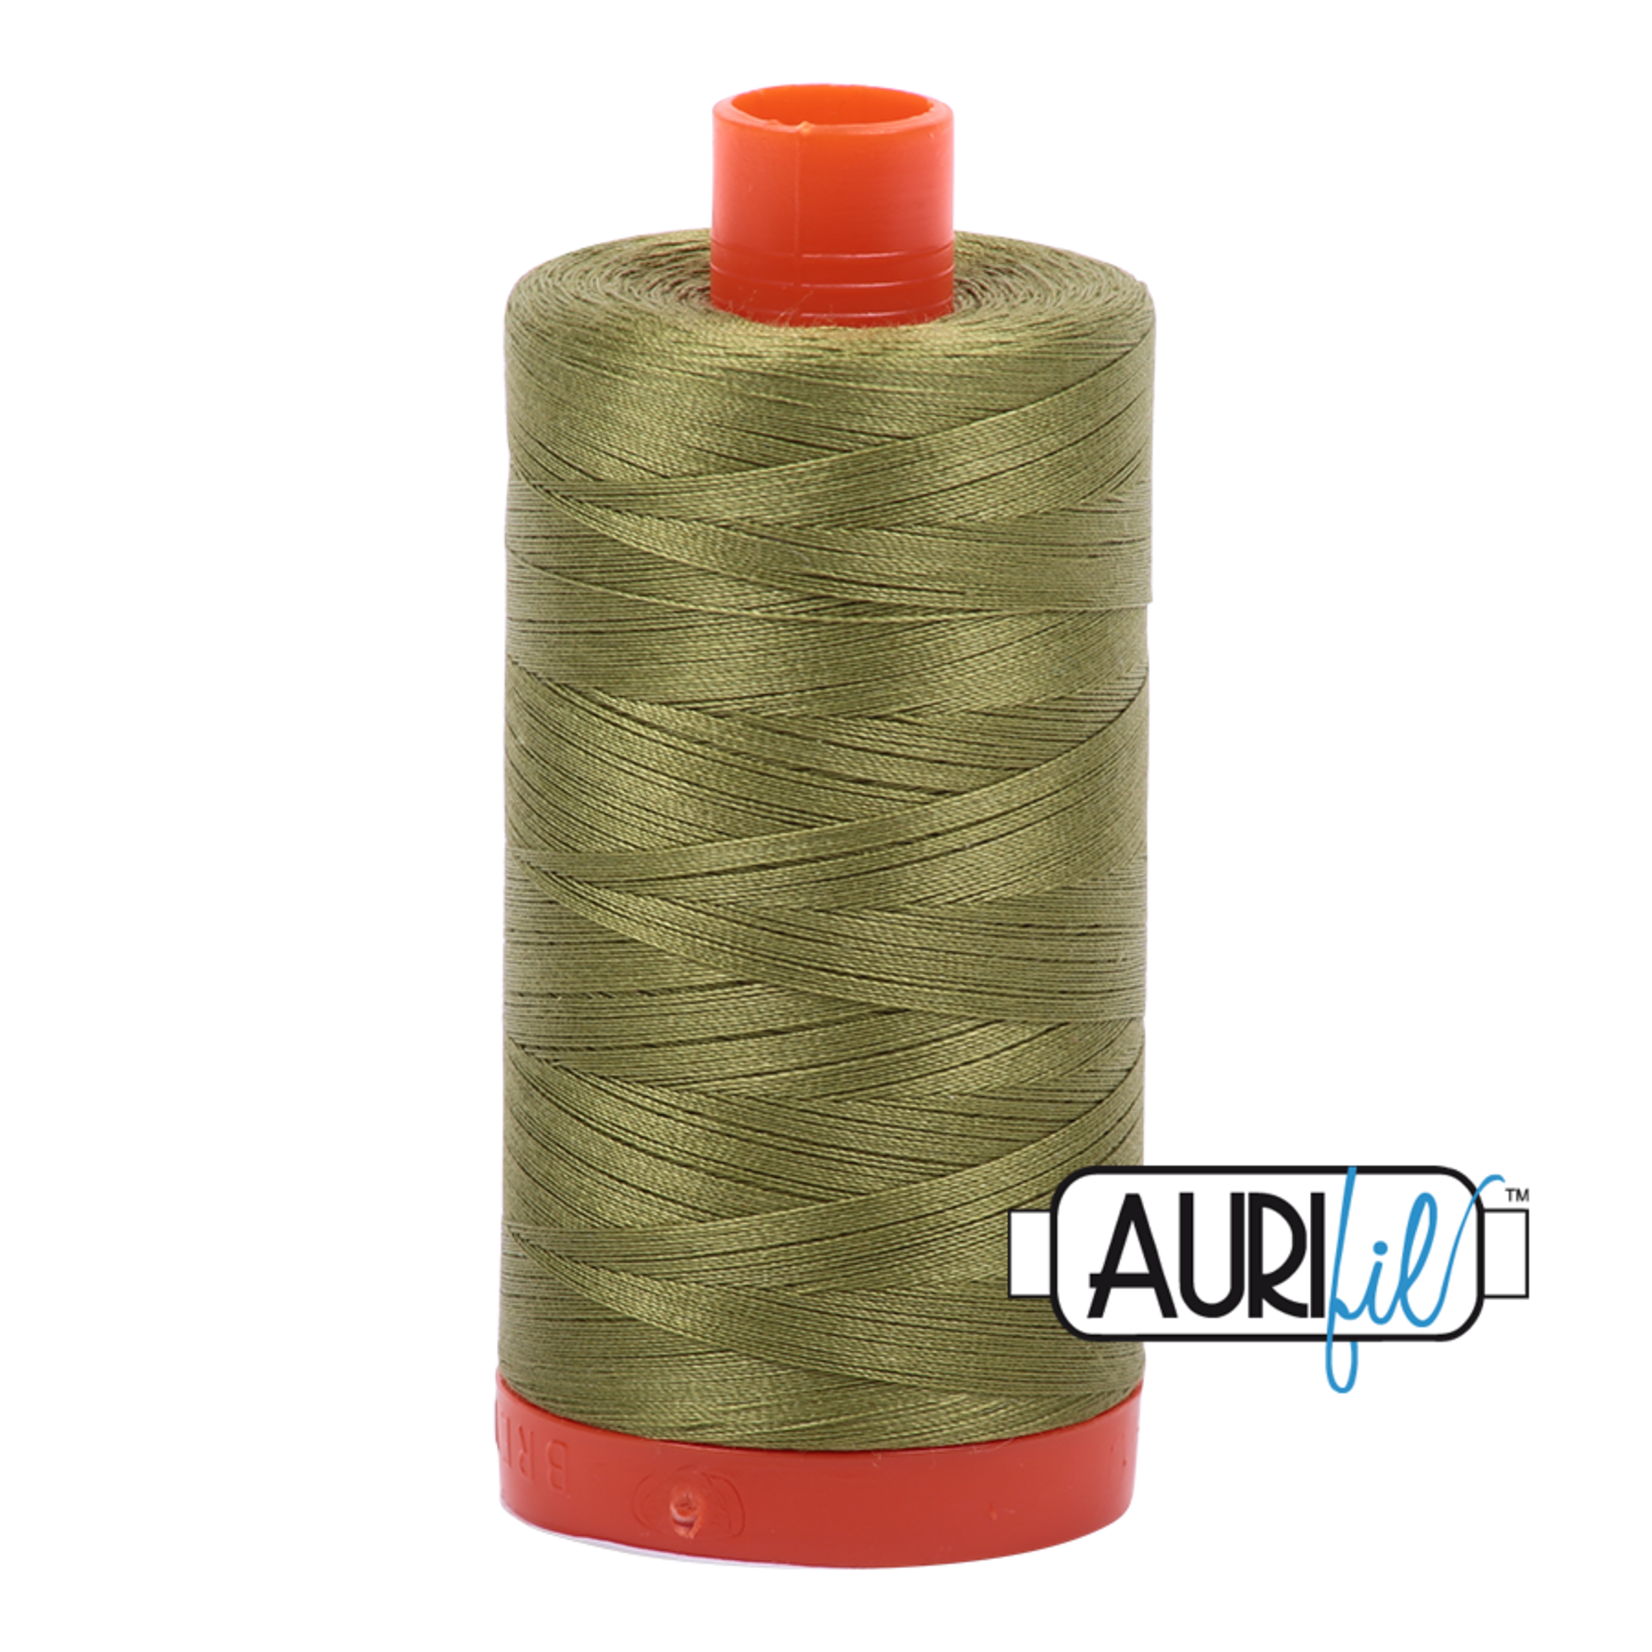 AURIFIL AURIFIL 50 WT Olive Green 5016